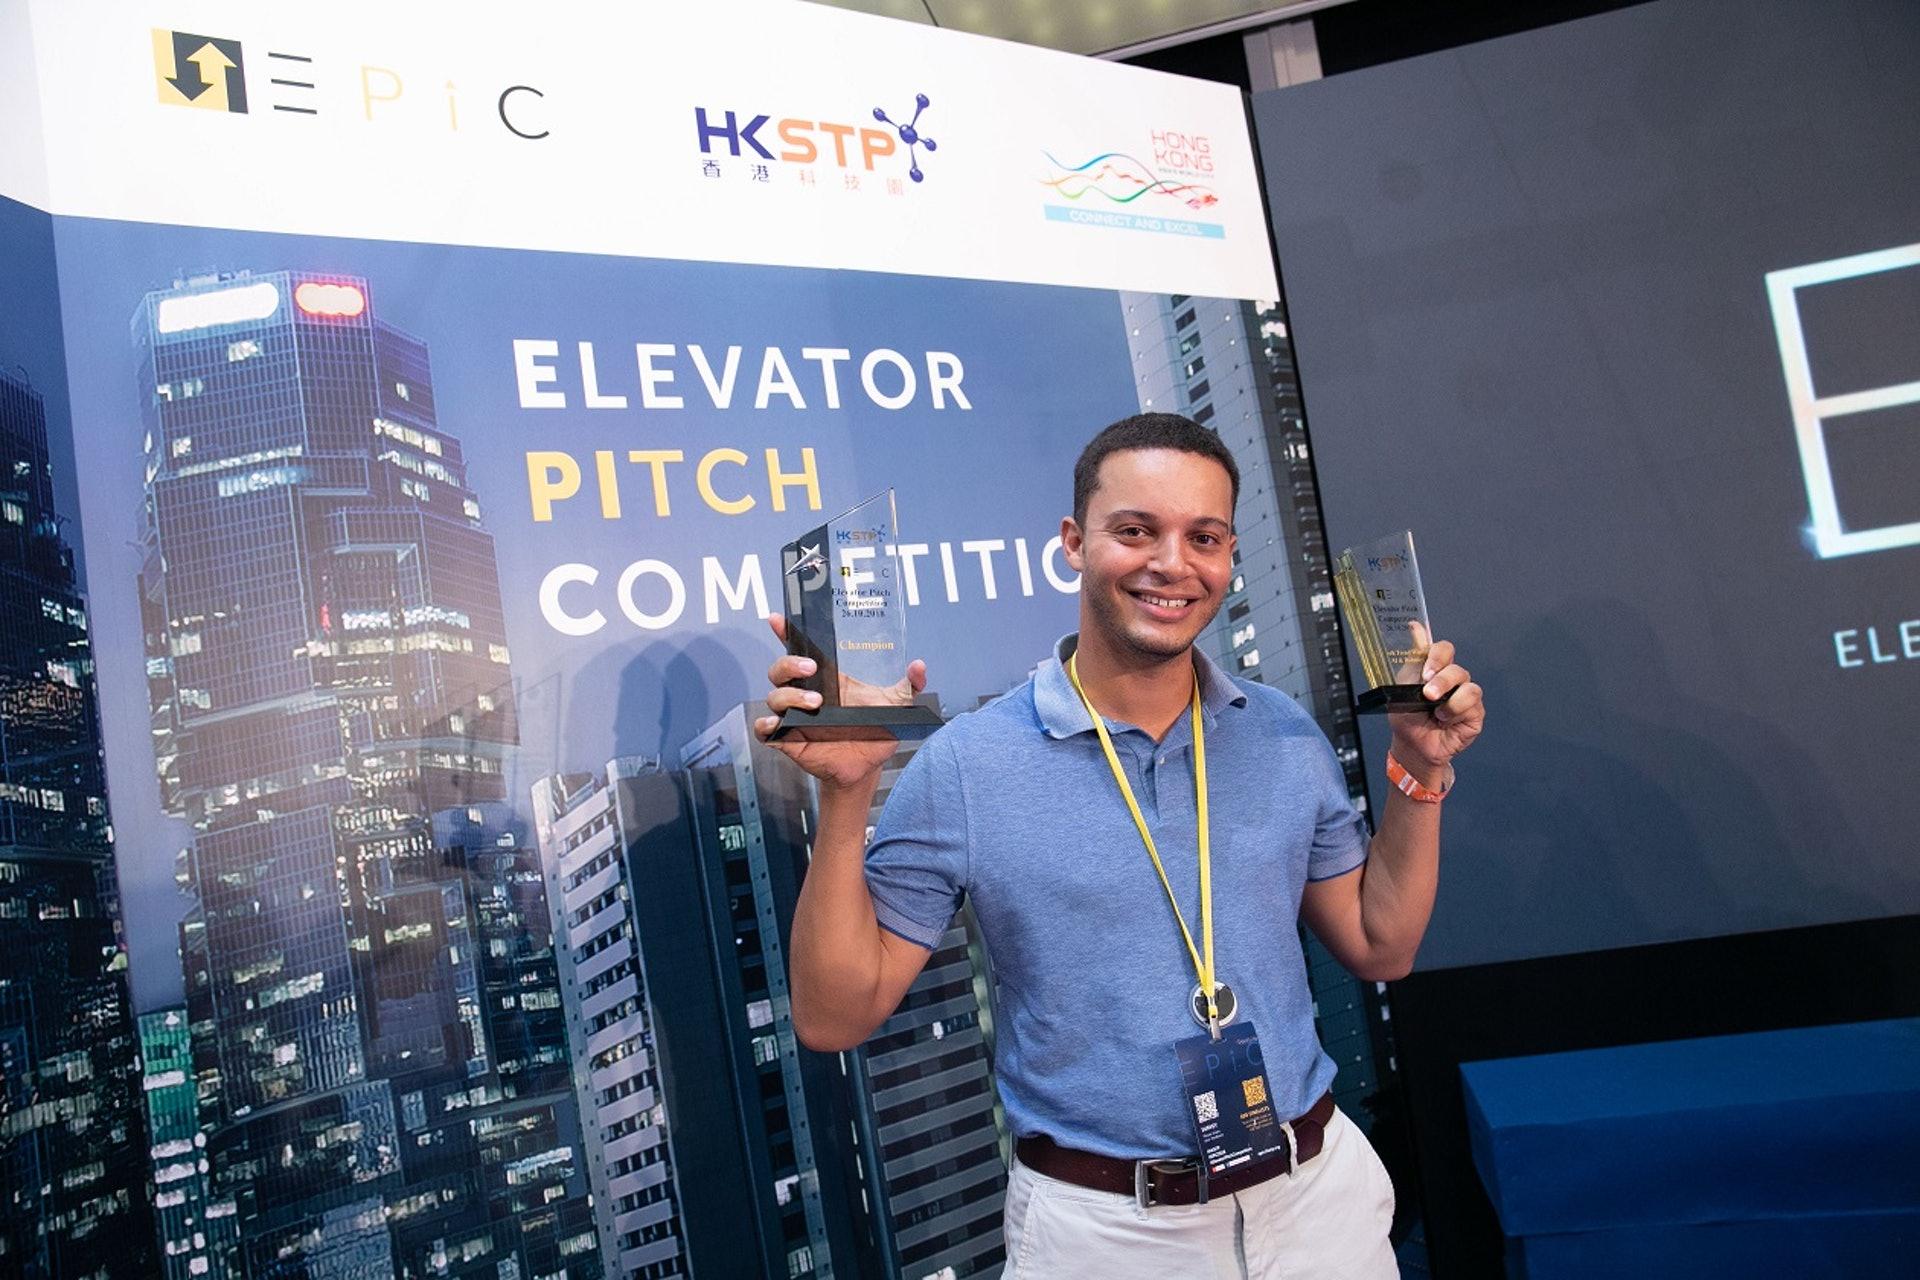 DASH Systems的創辦人Joel Ifill指自己是首度參與電梯募投比賽,能獲獎實在是喜出望外。